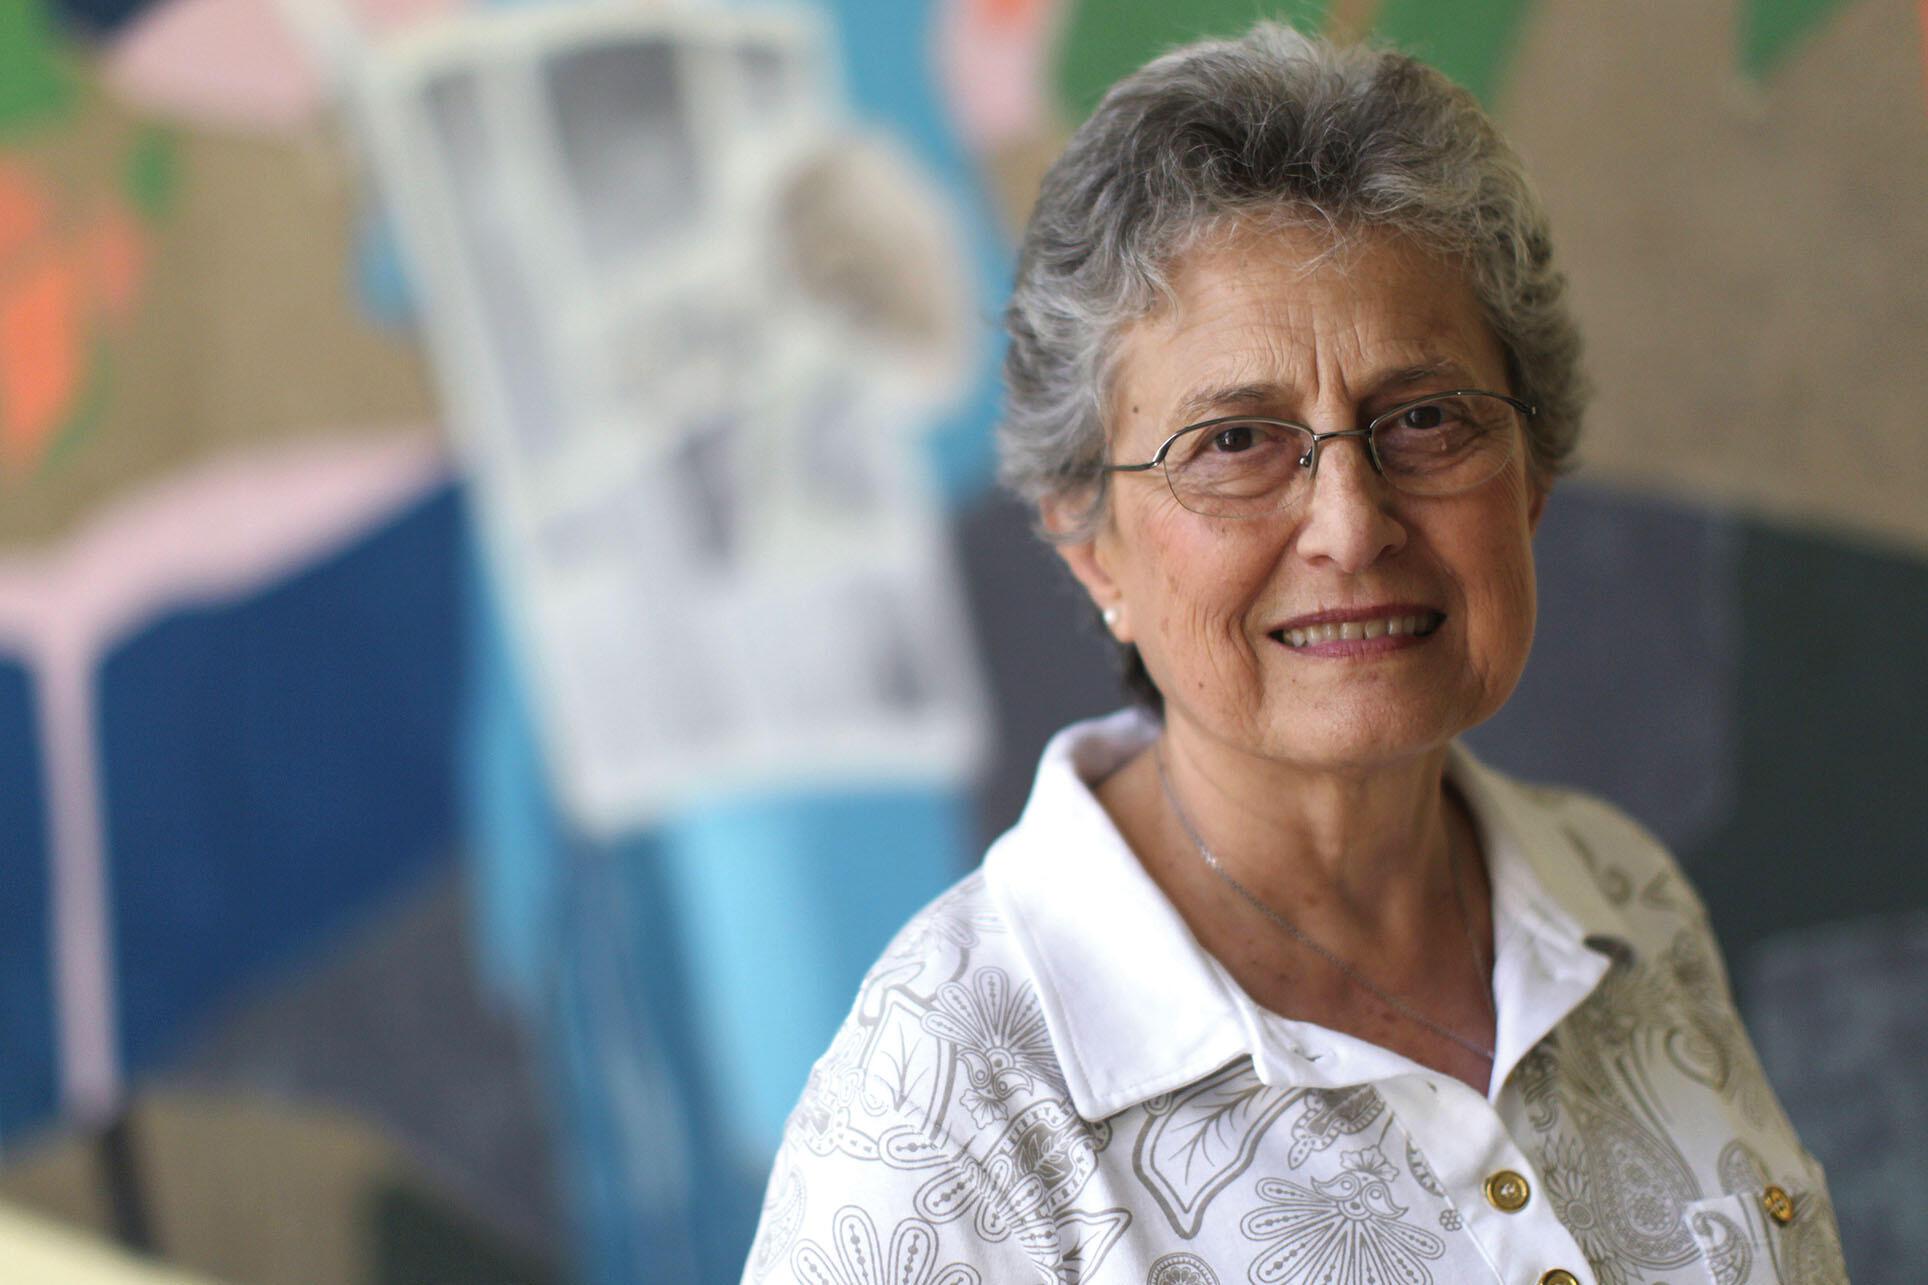 A portrait of Ivone Gebara in 2011. (Photo by Jorge A. Ramirez Portela/AP Images.)